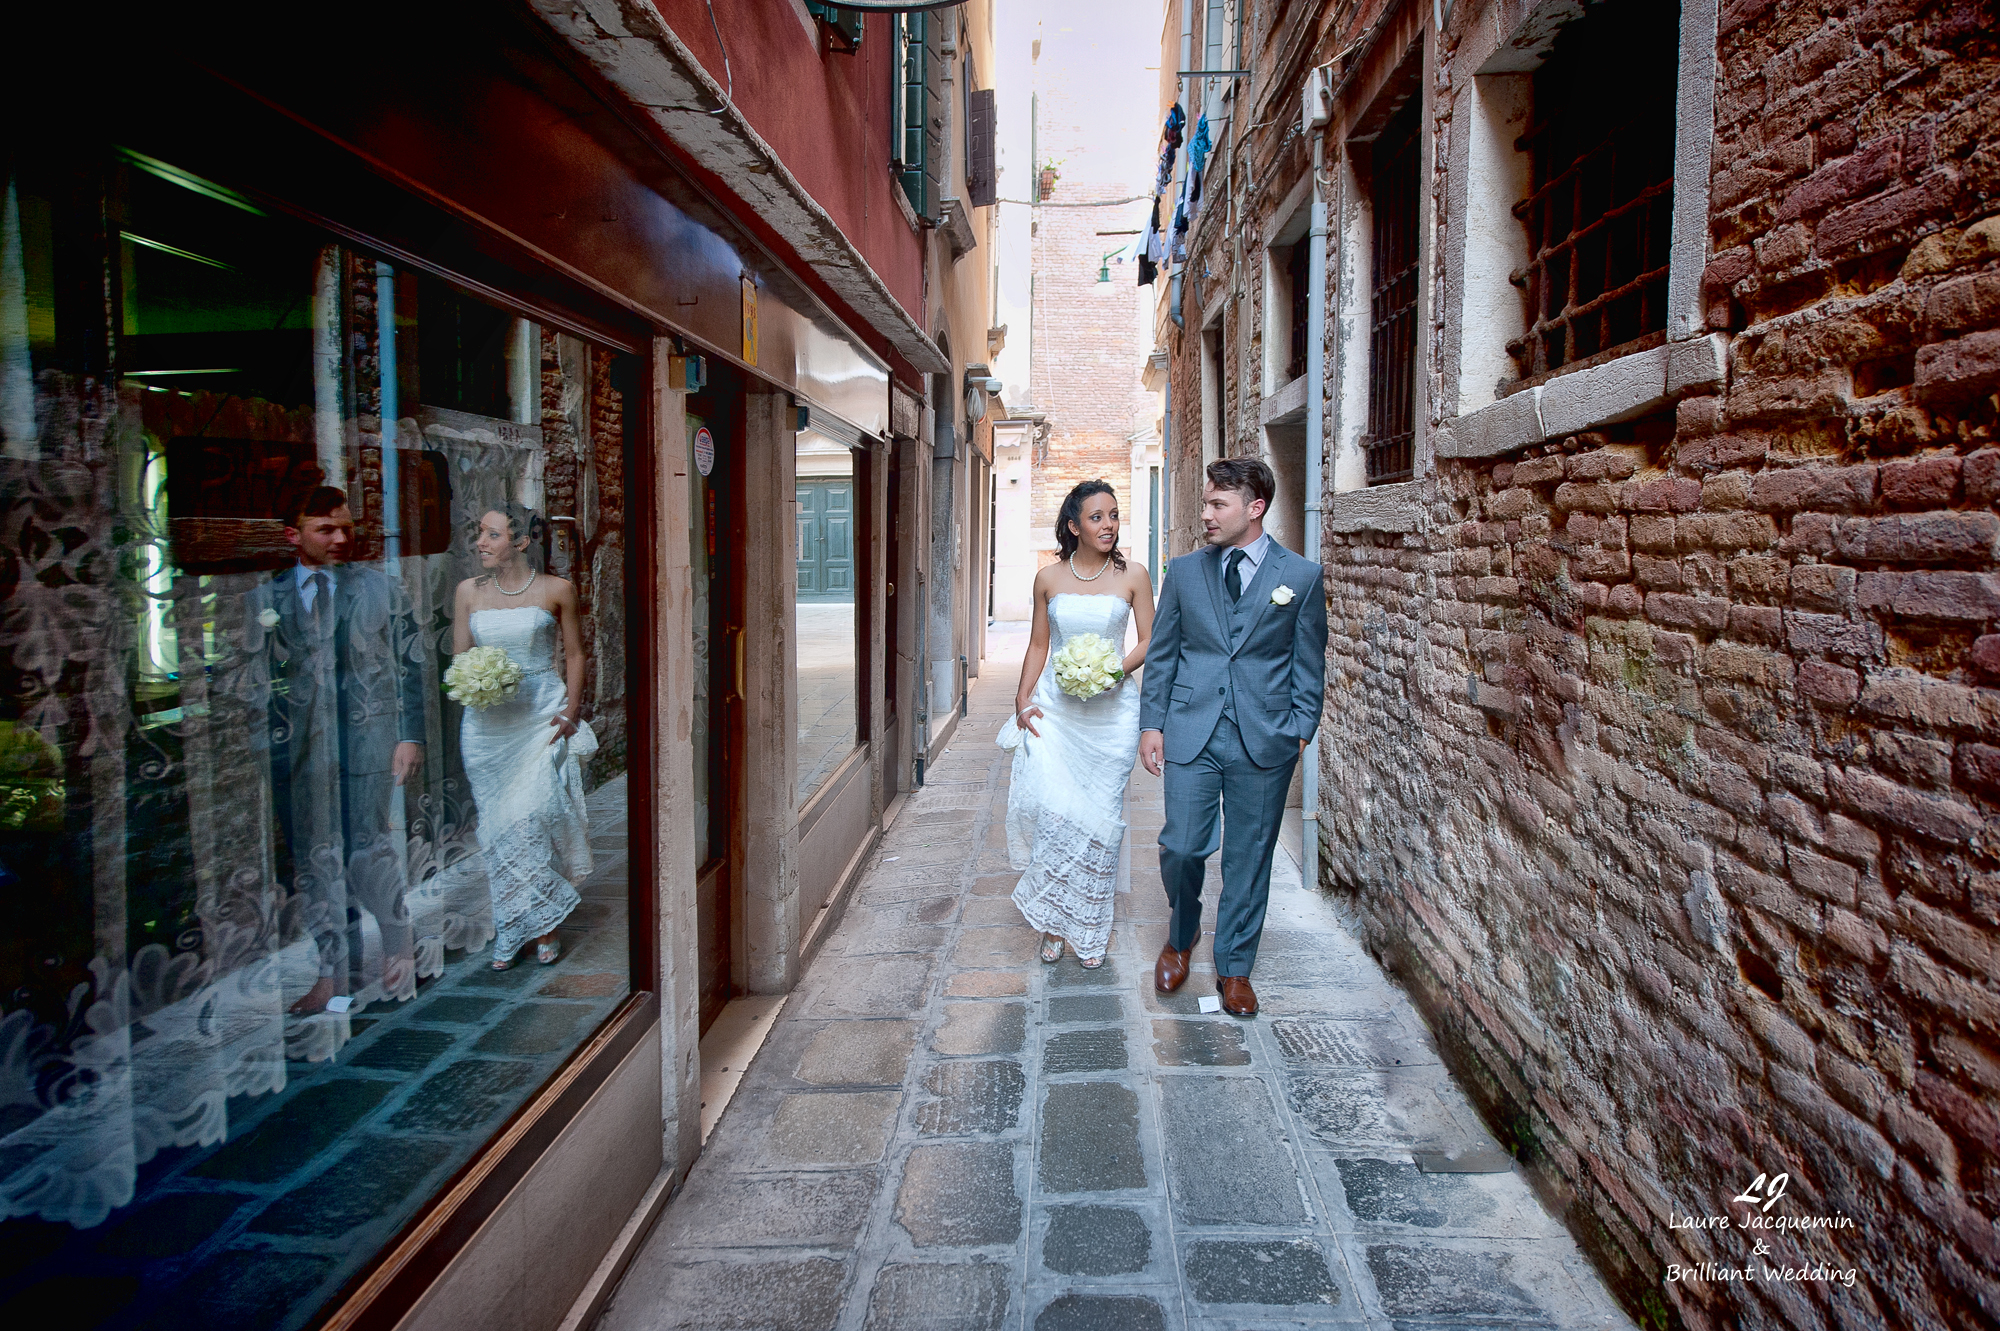 Venice Simbolic Wedding gondola venice Italy laure jacquemin photography (14) copia